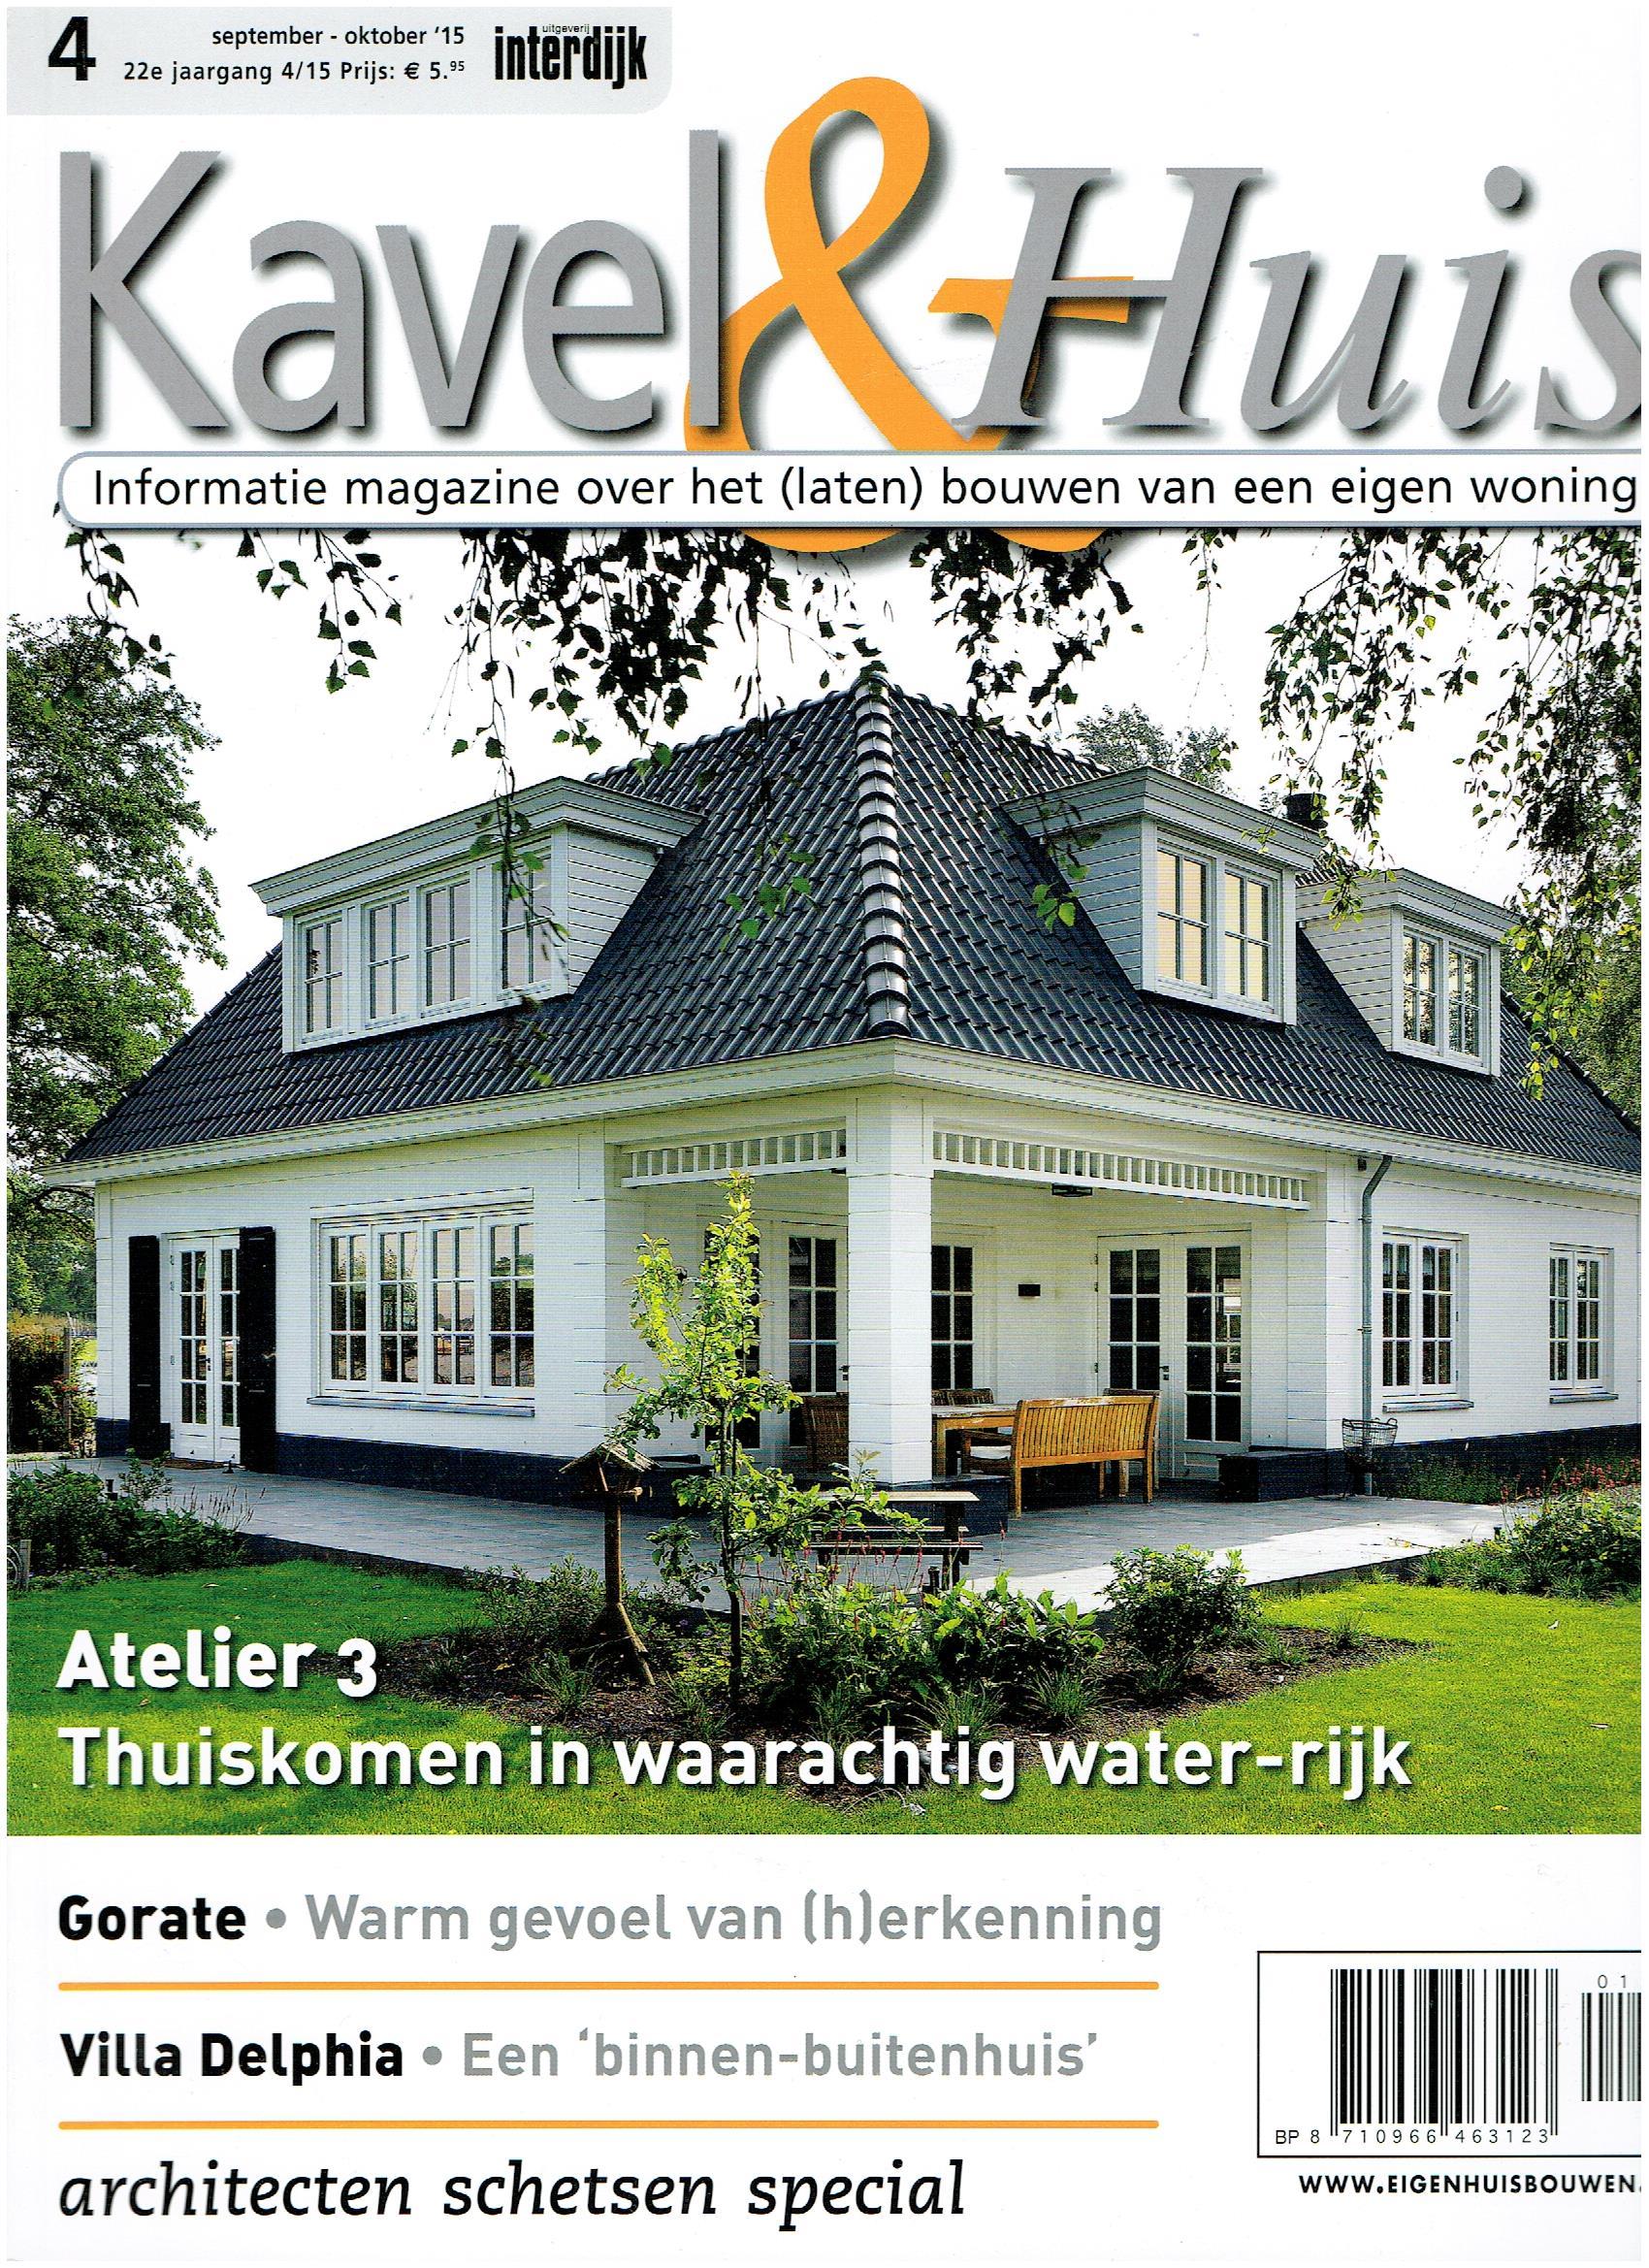 Portfolio bouwtekst for Kavel en huis droomhuis